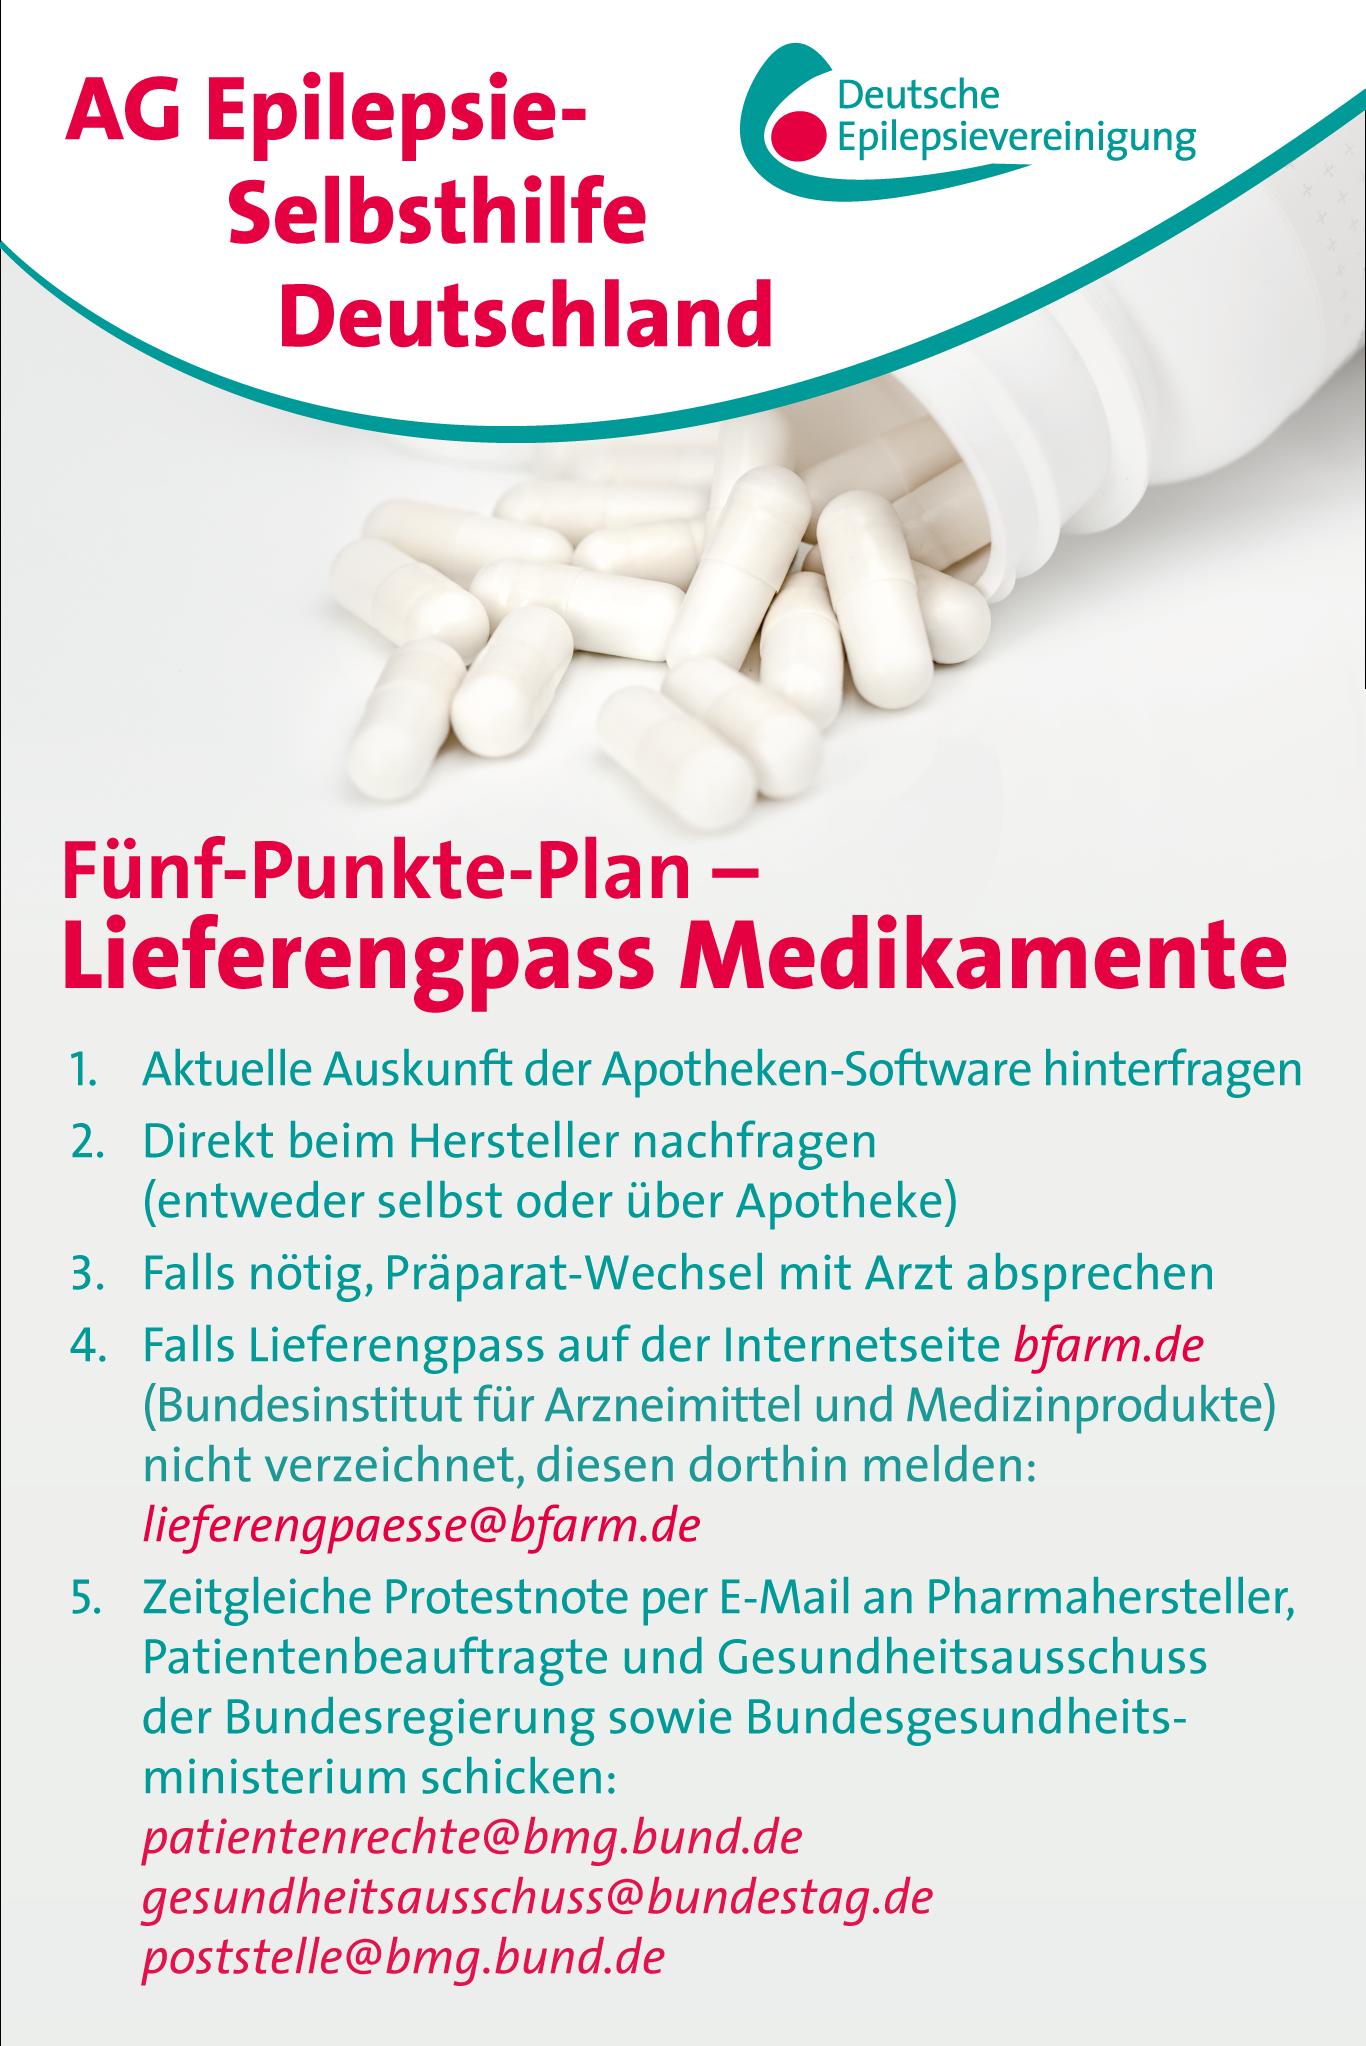 Fünf-Punkte-Plan – Lieferengpässe bei Medikamenten